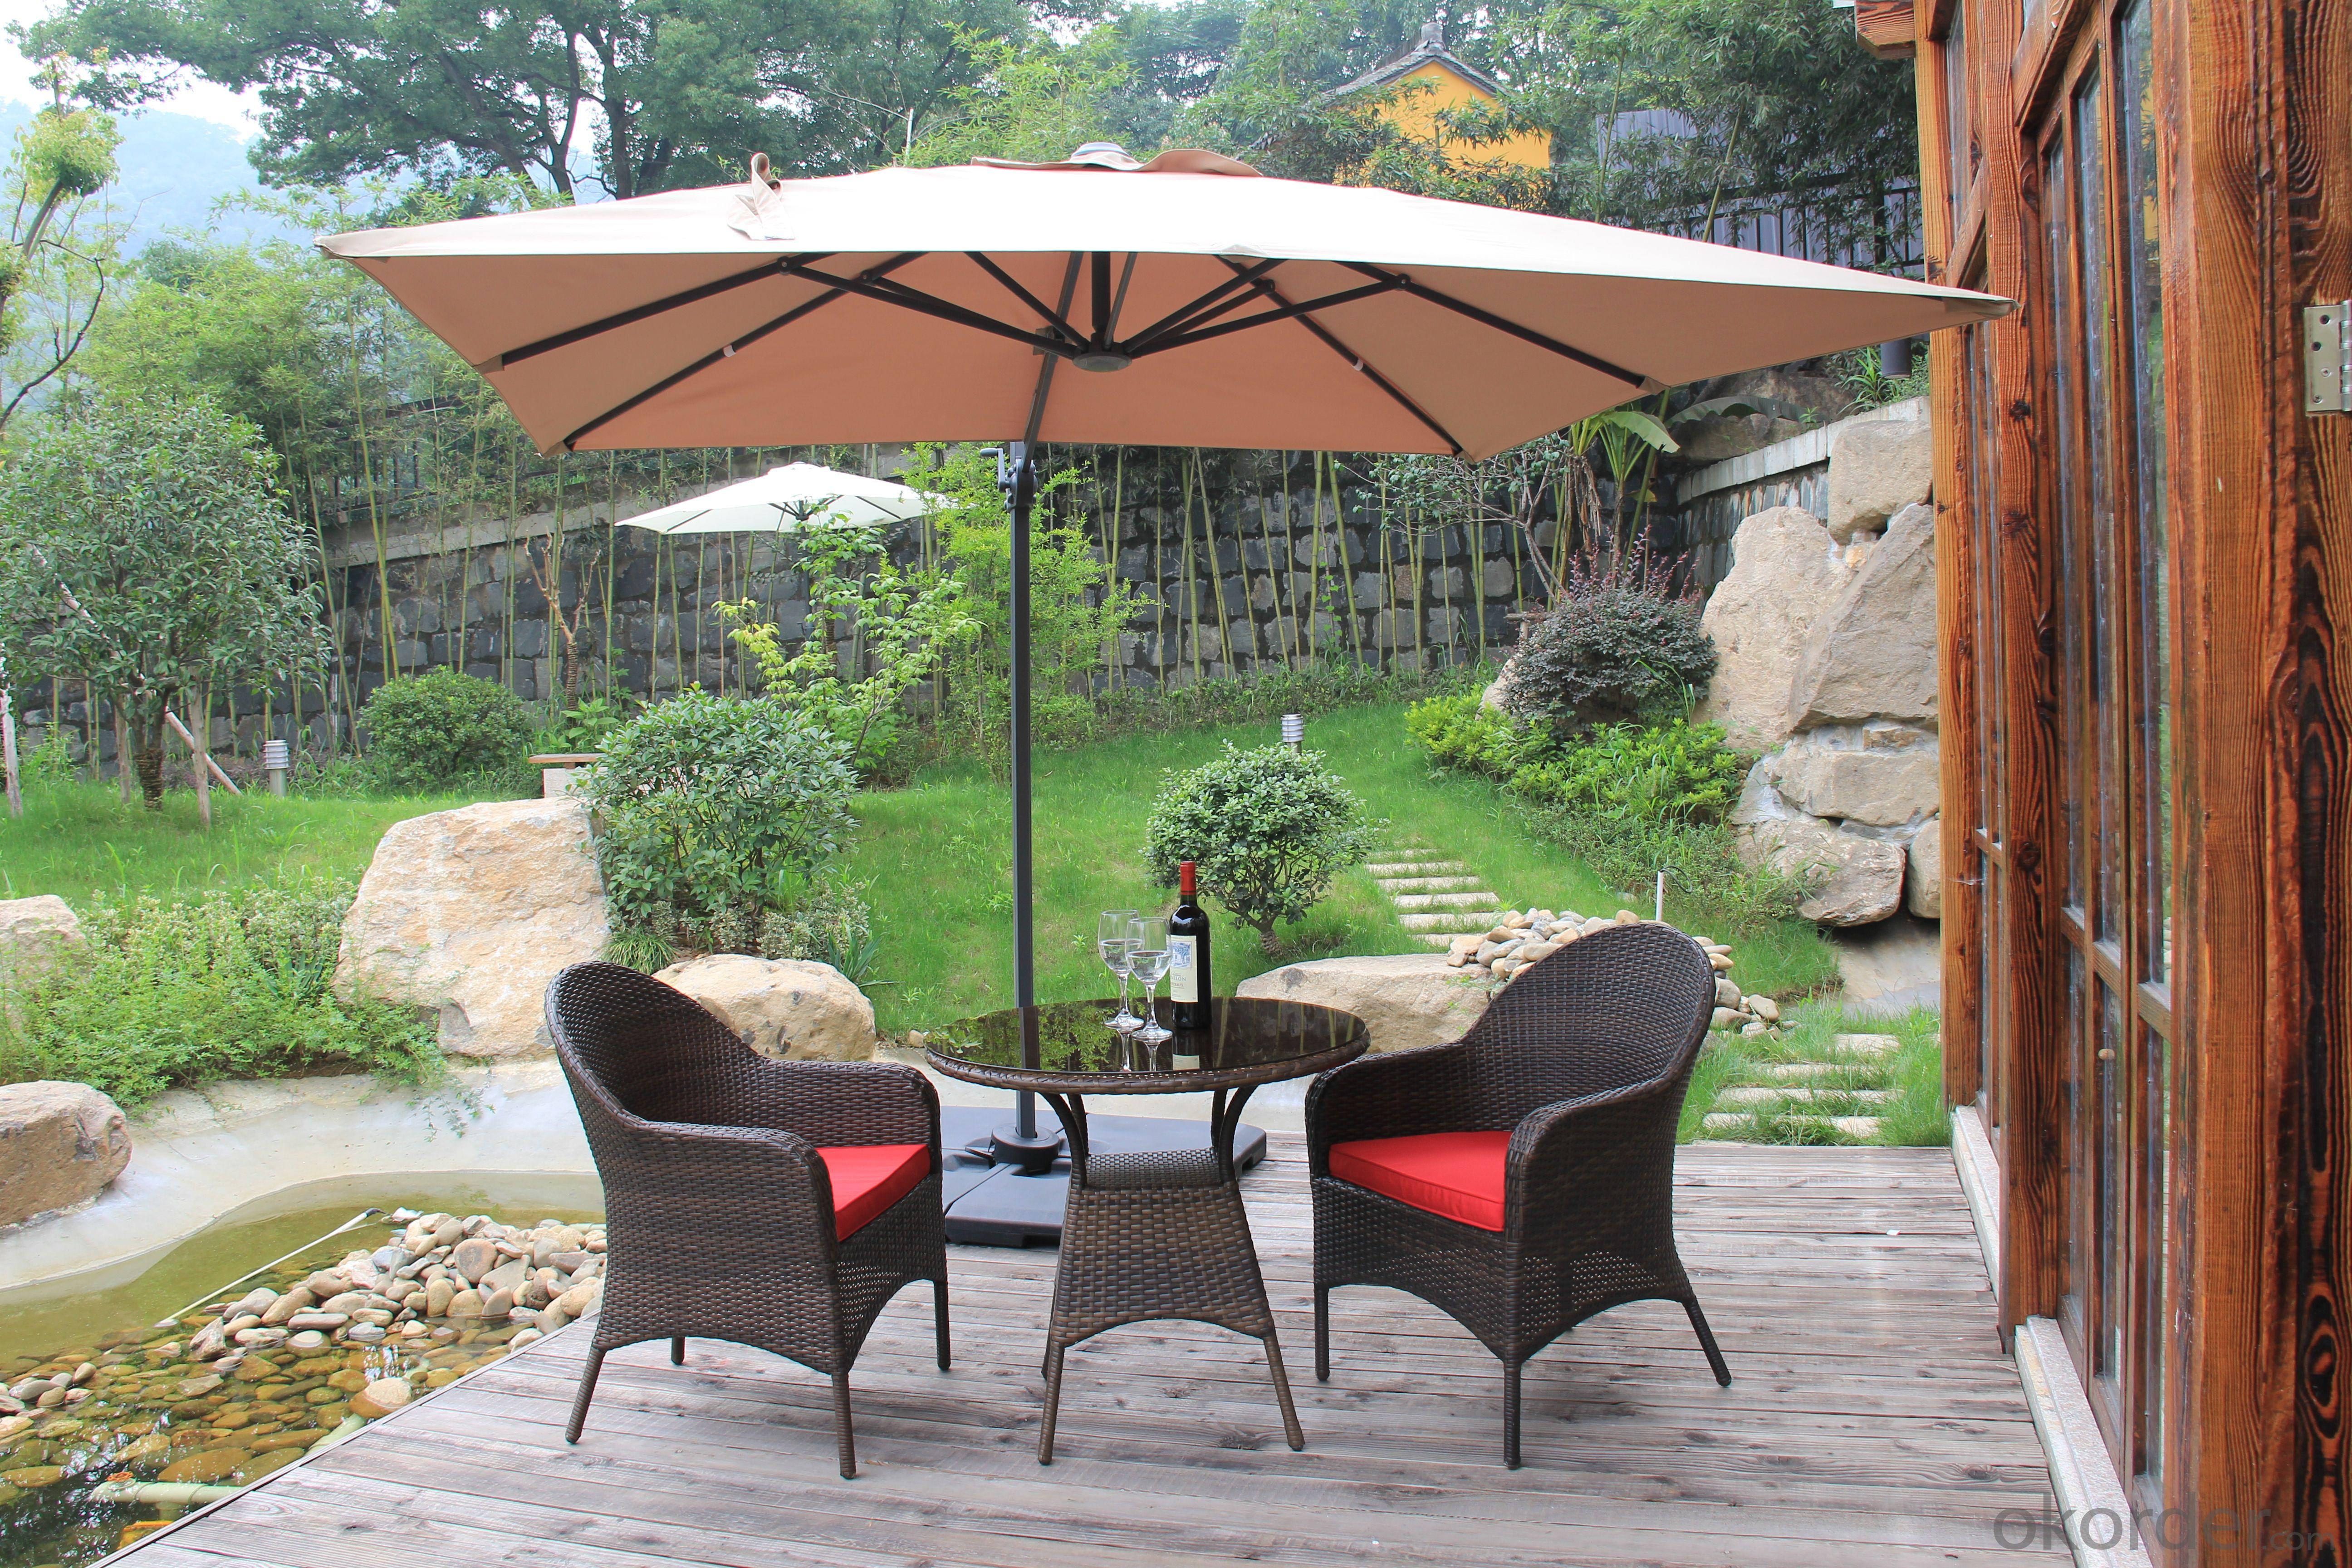 3PC Rattan Seater Outdoor Garden Furniture